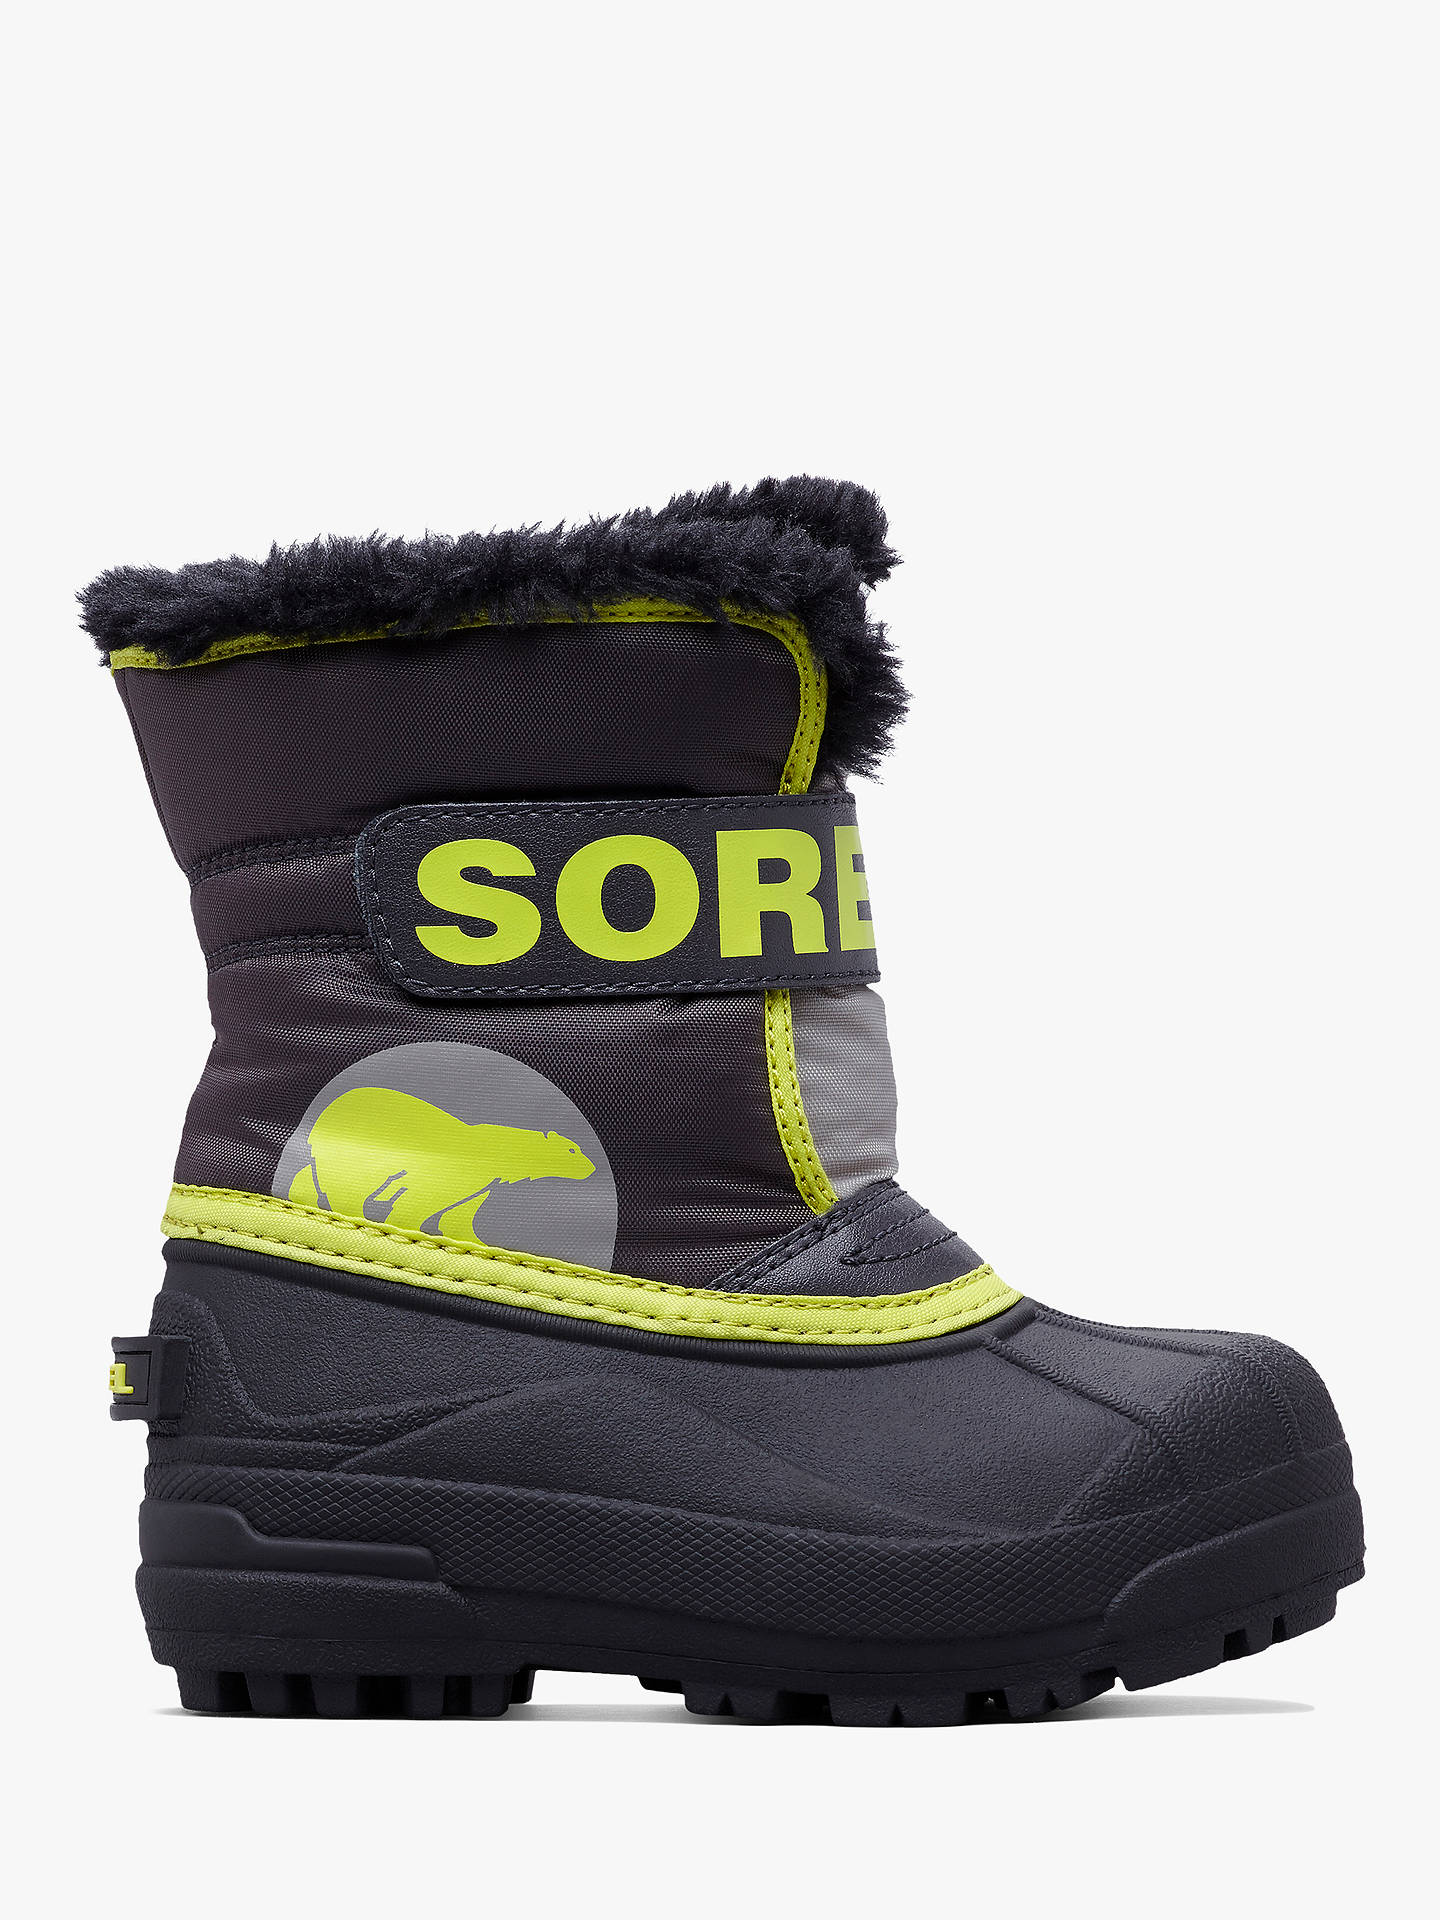 e4edbec6cf5 Sorel Children s Snow Commander Snow Boots at John Lewis   Partners